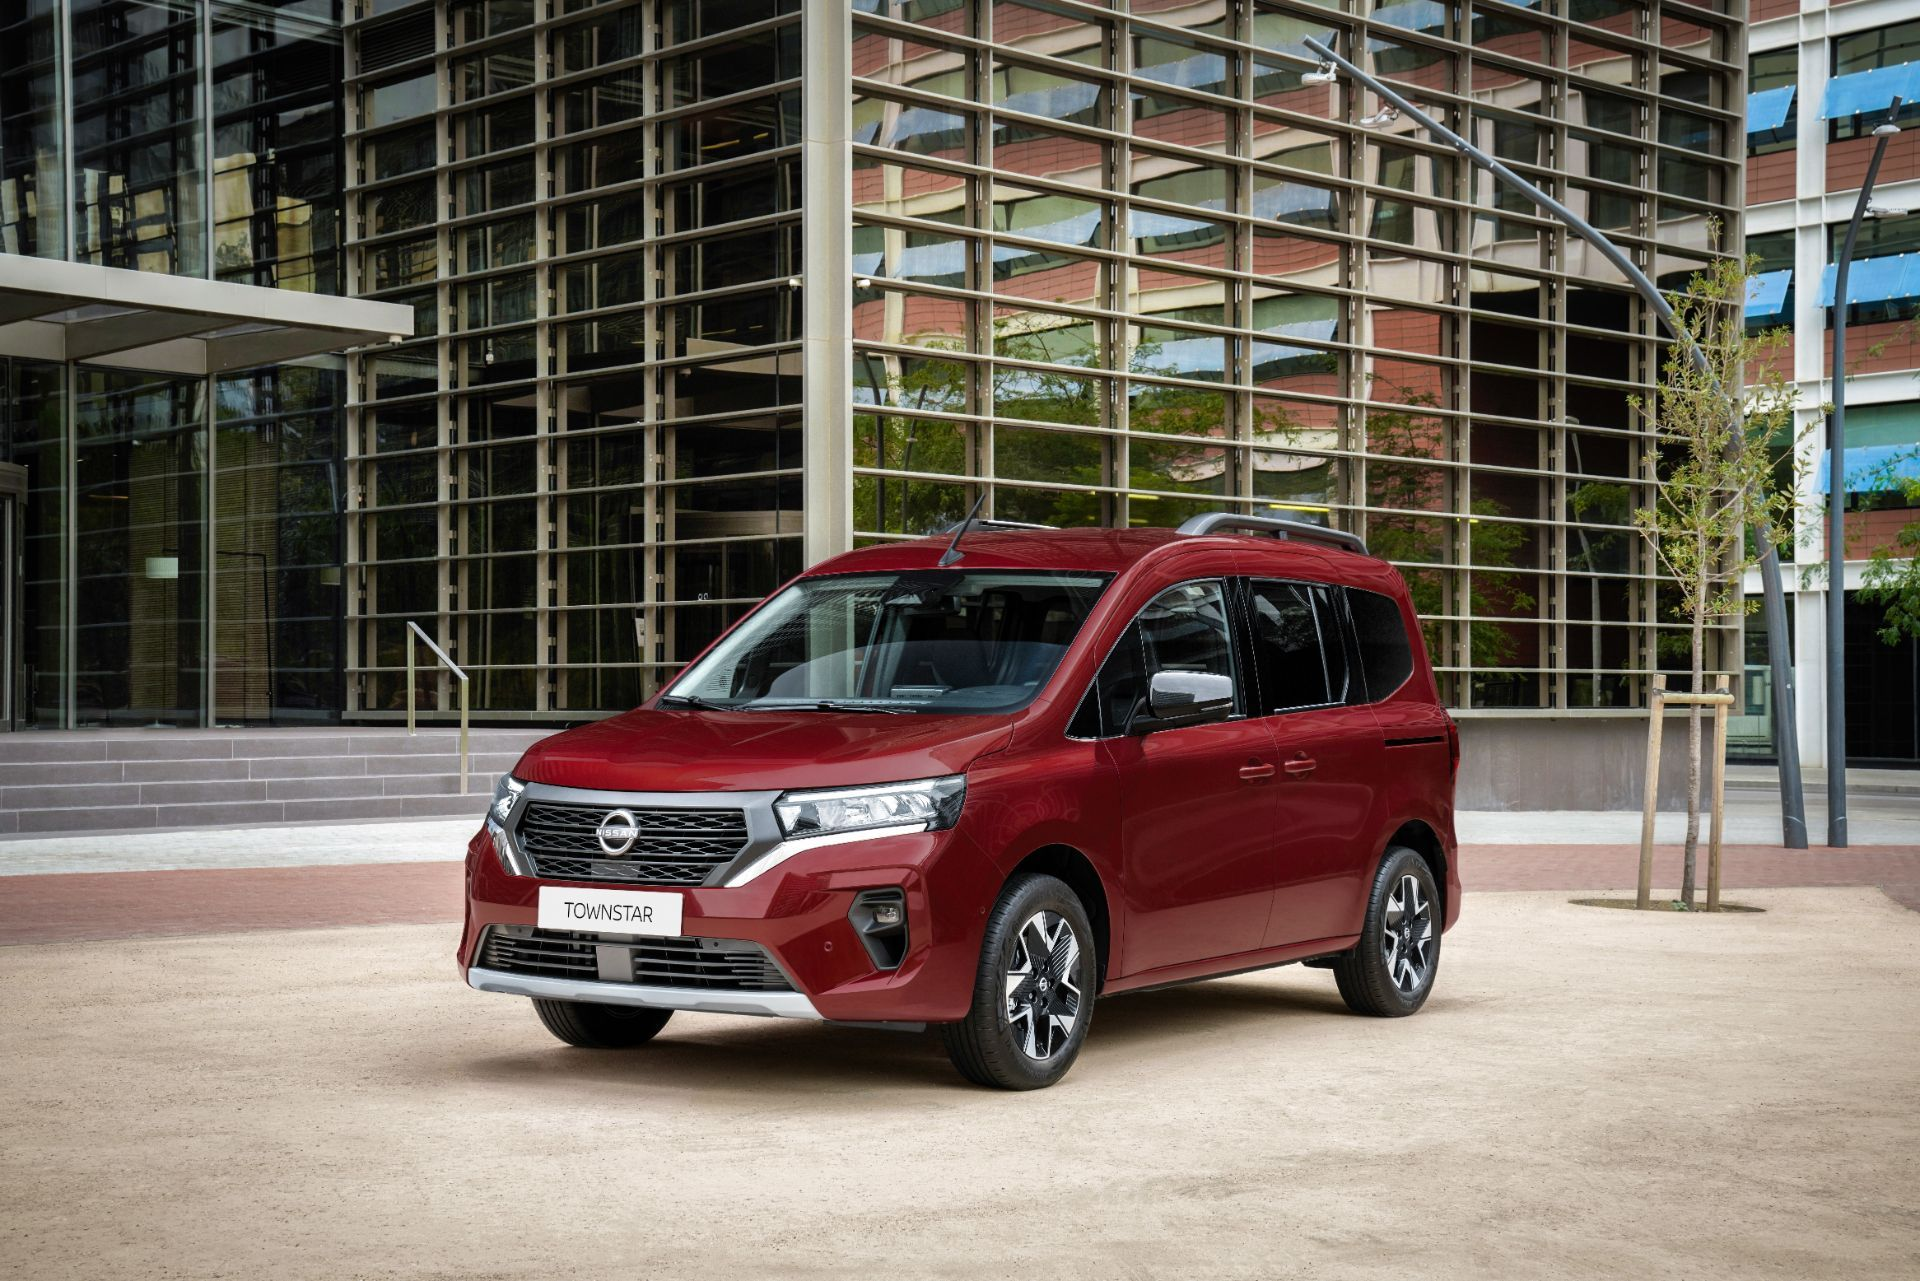 2022-Nissan-Townstar-petrol-combi-dynamic-2